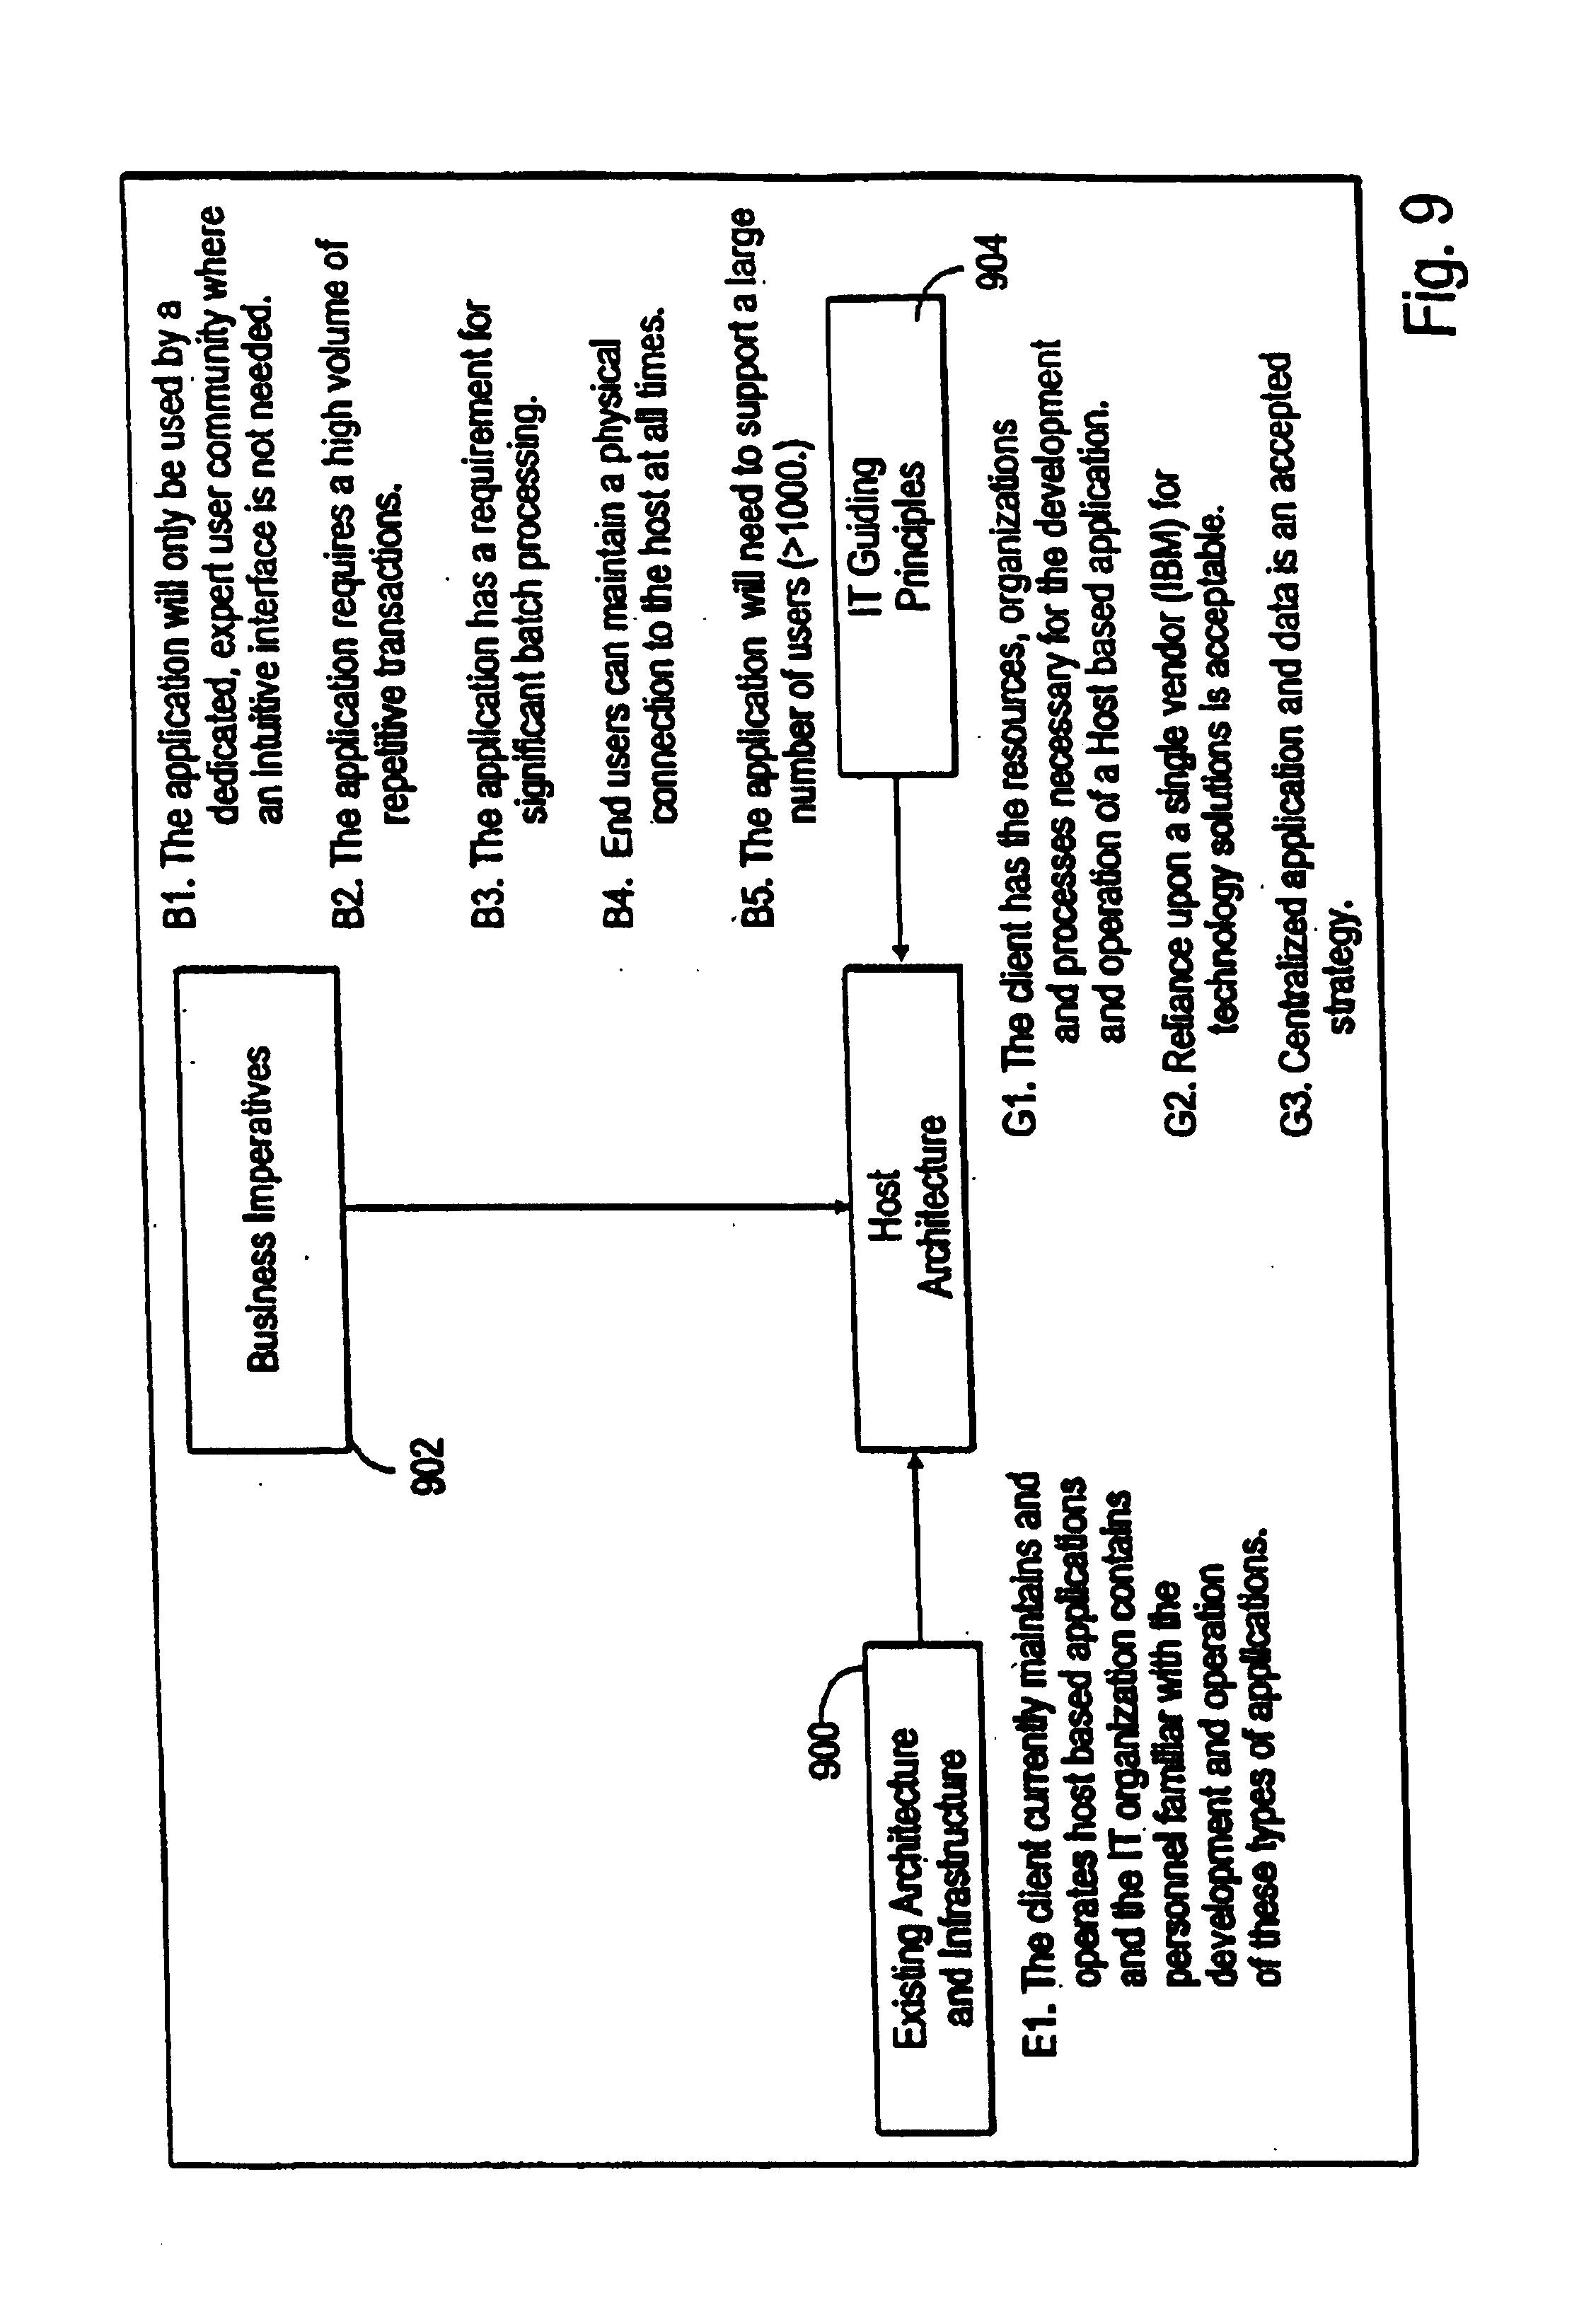 Patent Us 6742015 B1 Ci 65 Central Locking Interface Wiring Diagram